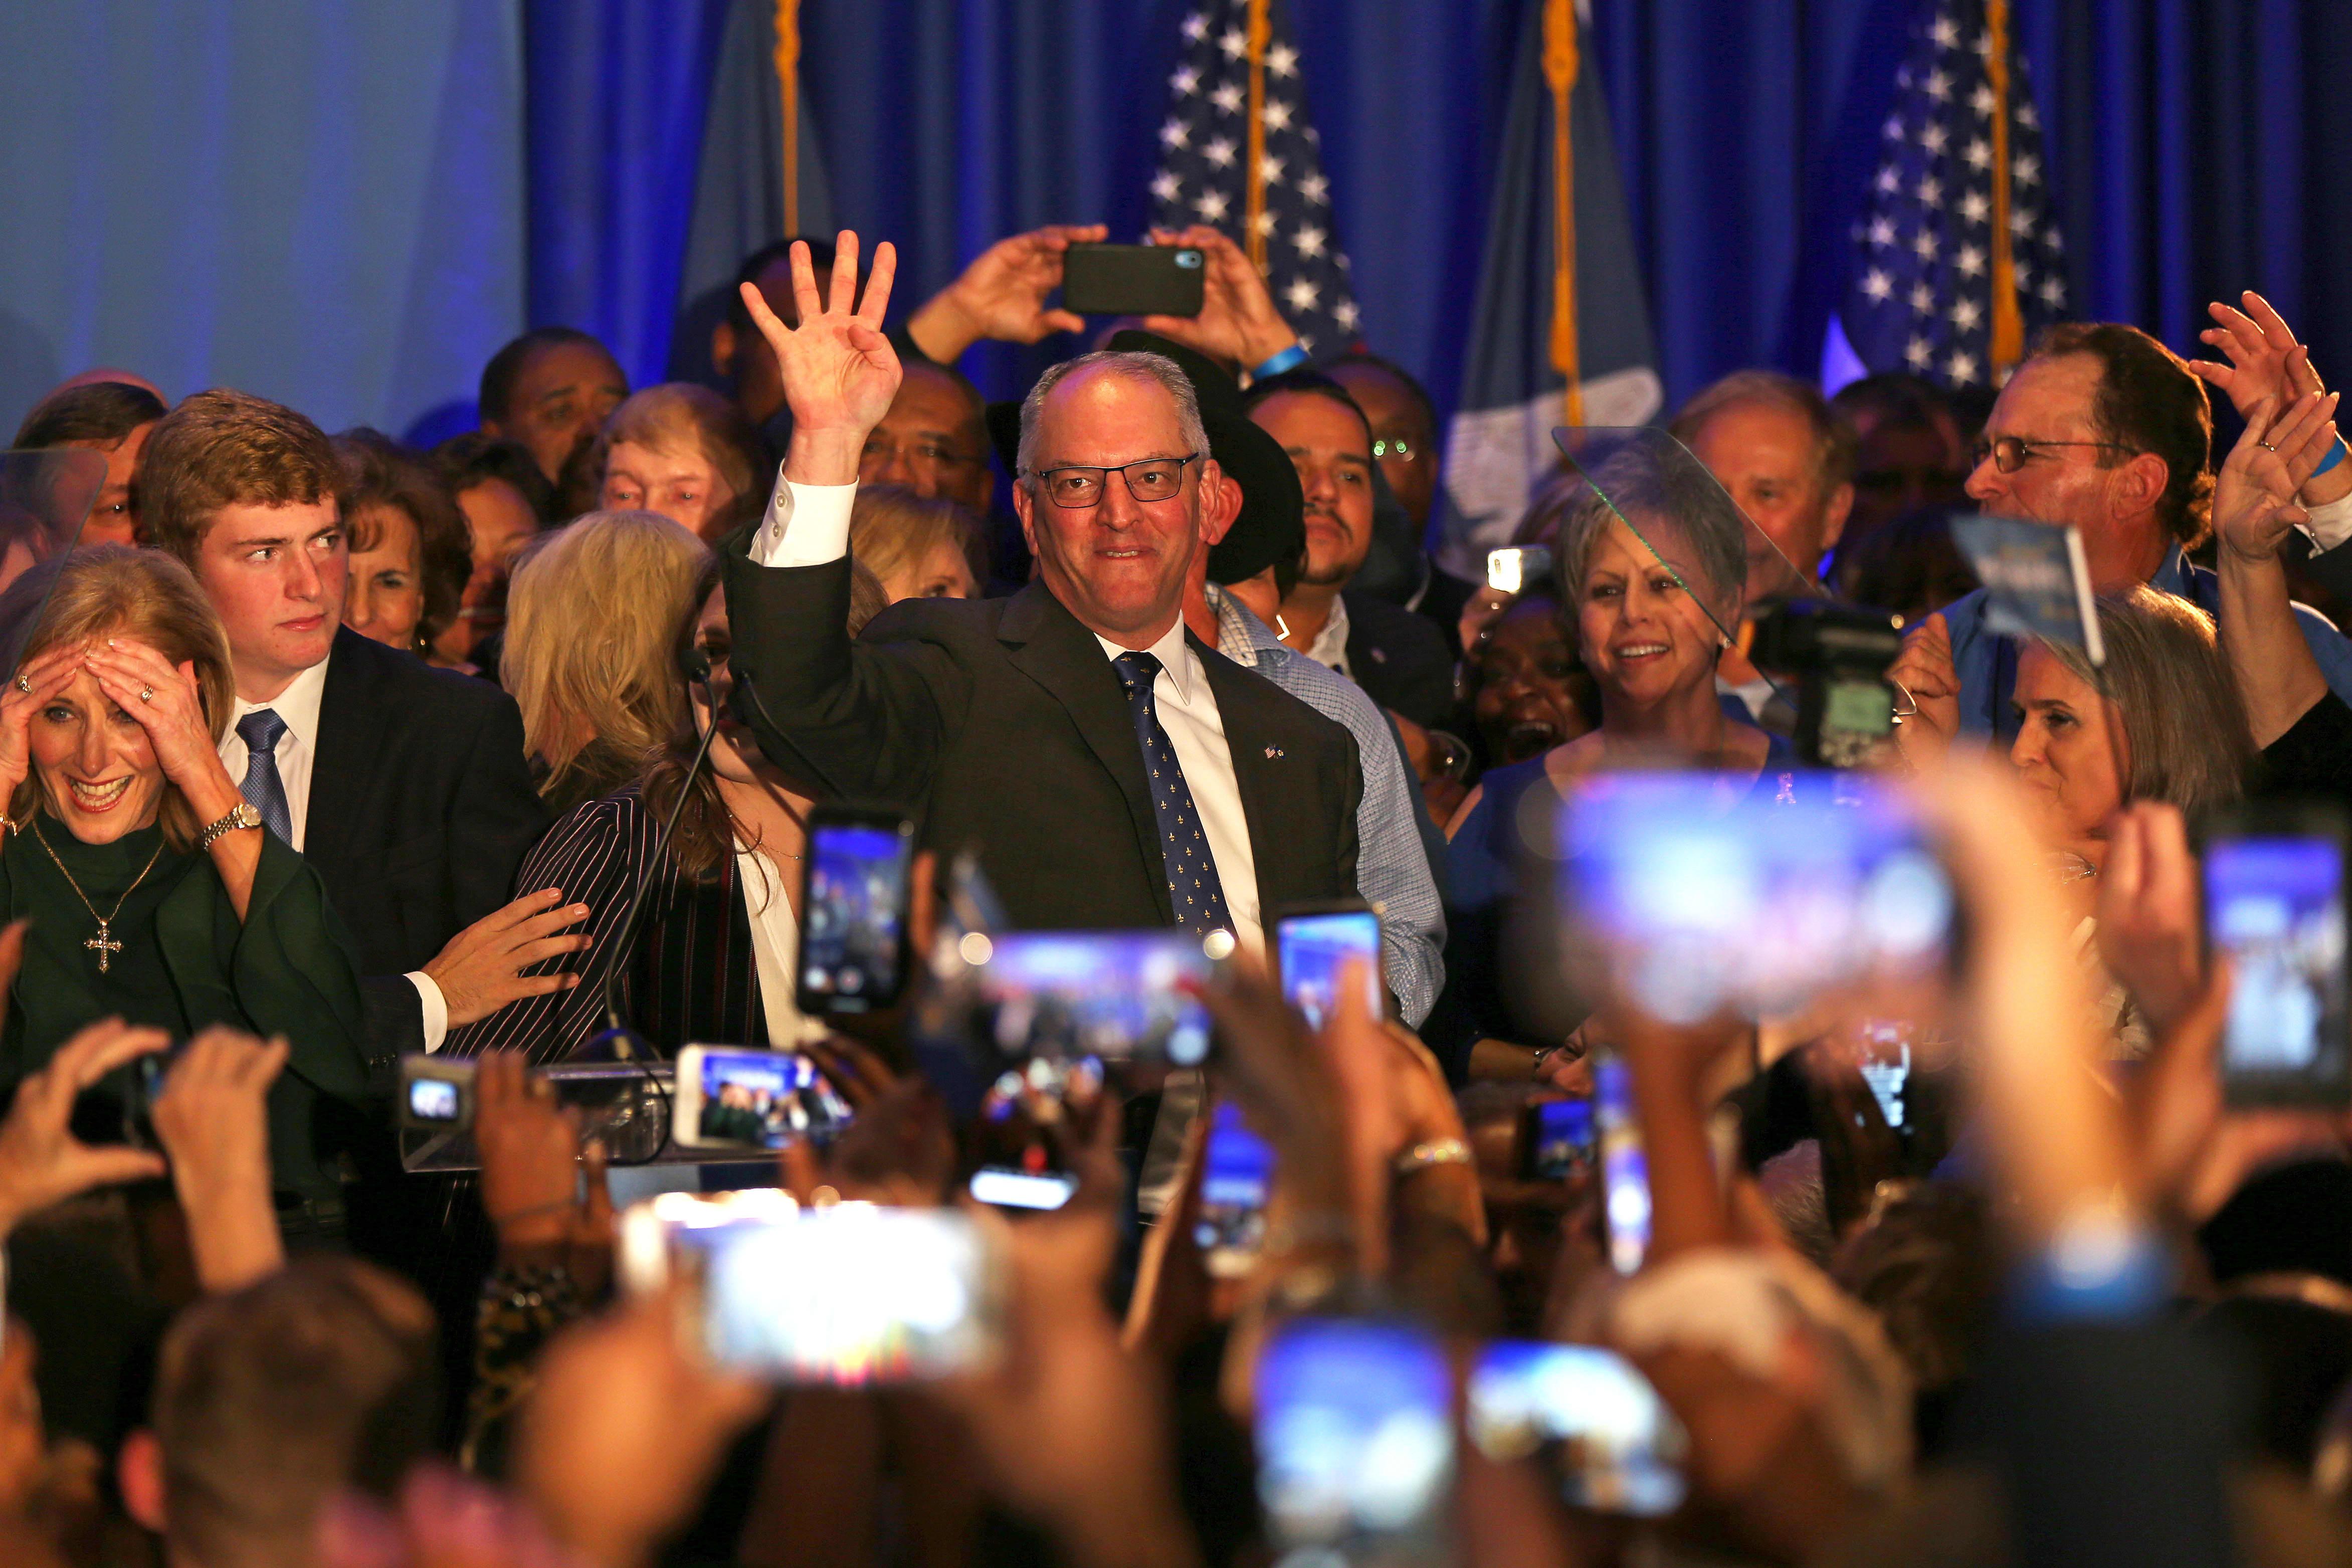 Democrats hold on to Louisiana governor's seat despite Trump